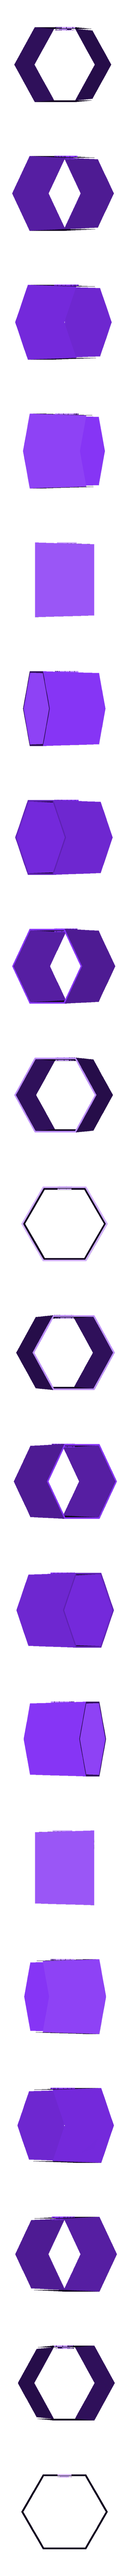 LH_hexa_body1_fixed_unten.stl Download free STL file Lighthouse • 3D printing template, jteix